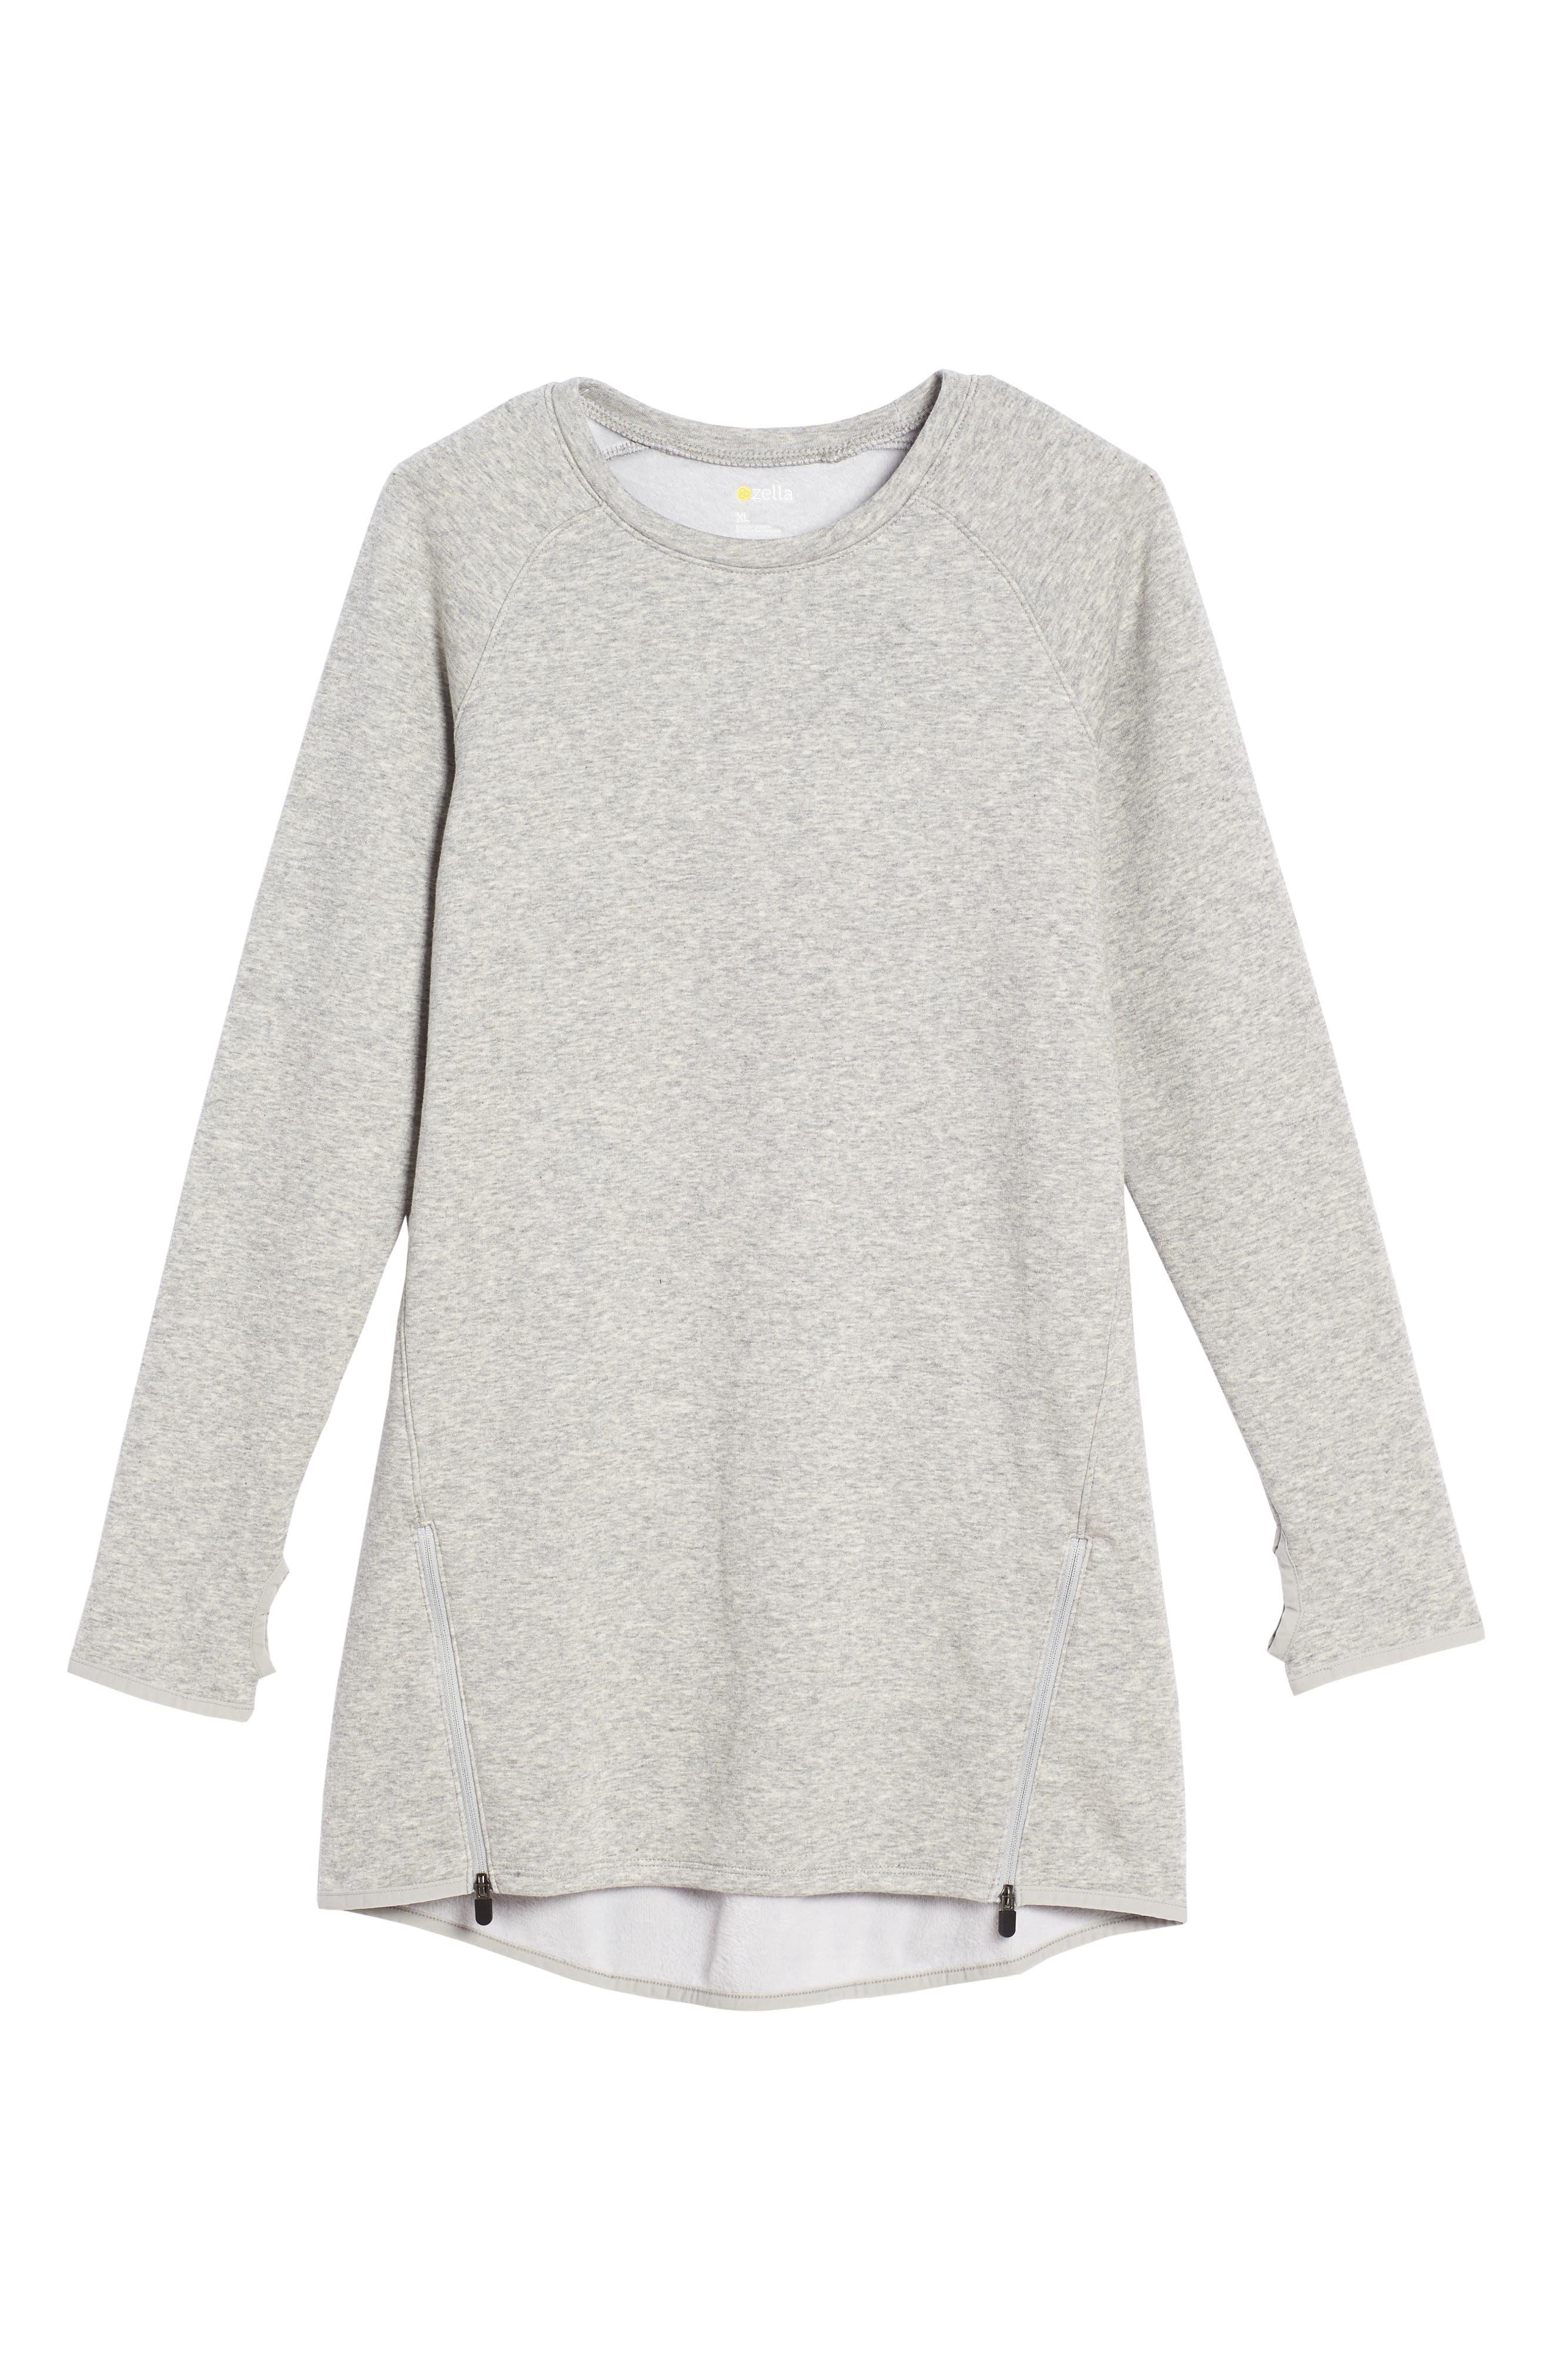 Zipper Sweatshirt Dress,                         Main,                         color, Grey Ash Heather